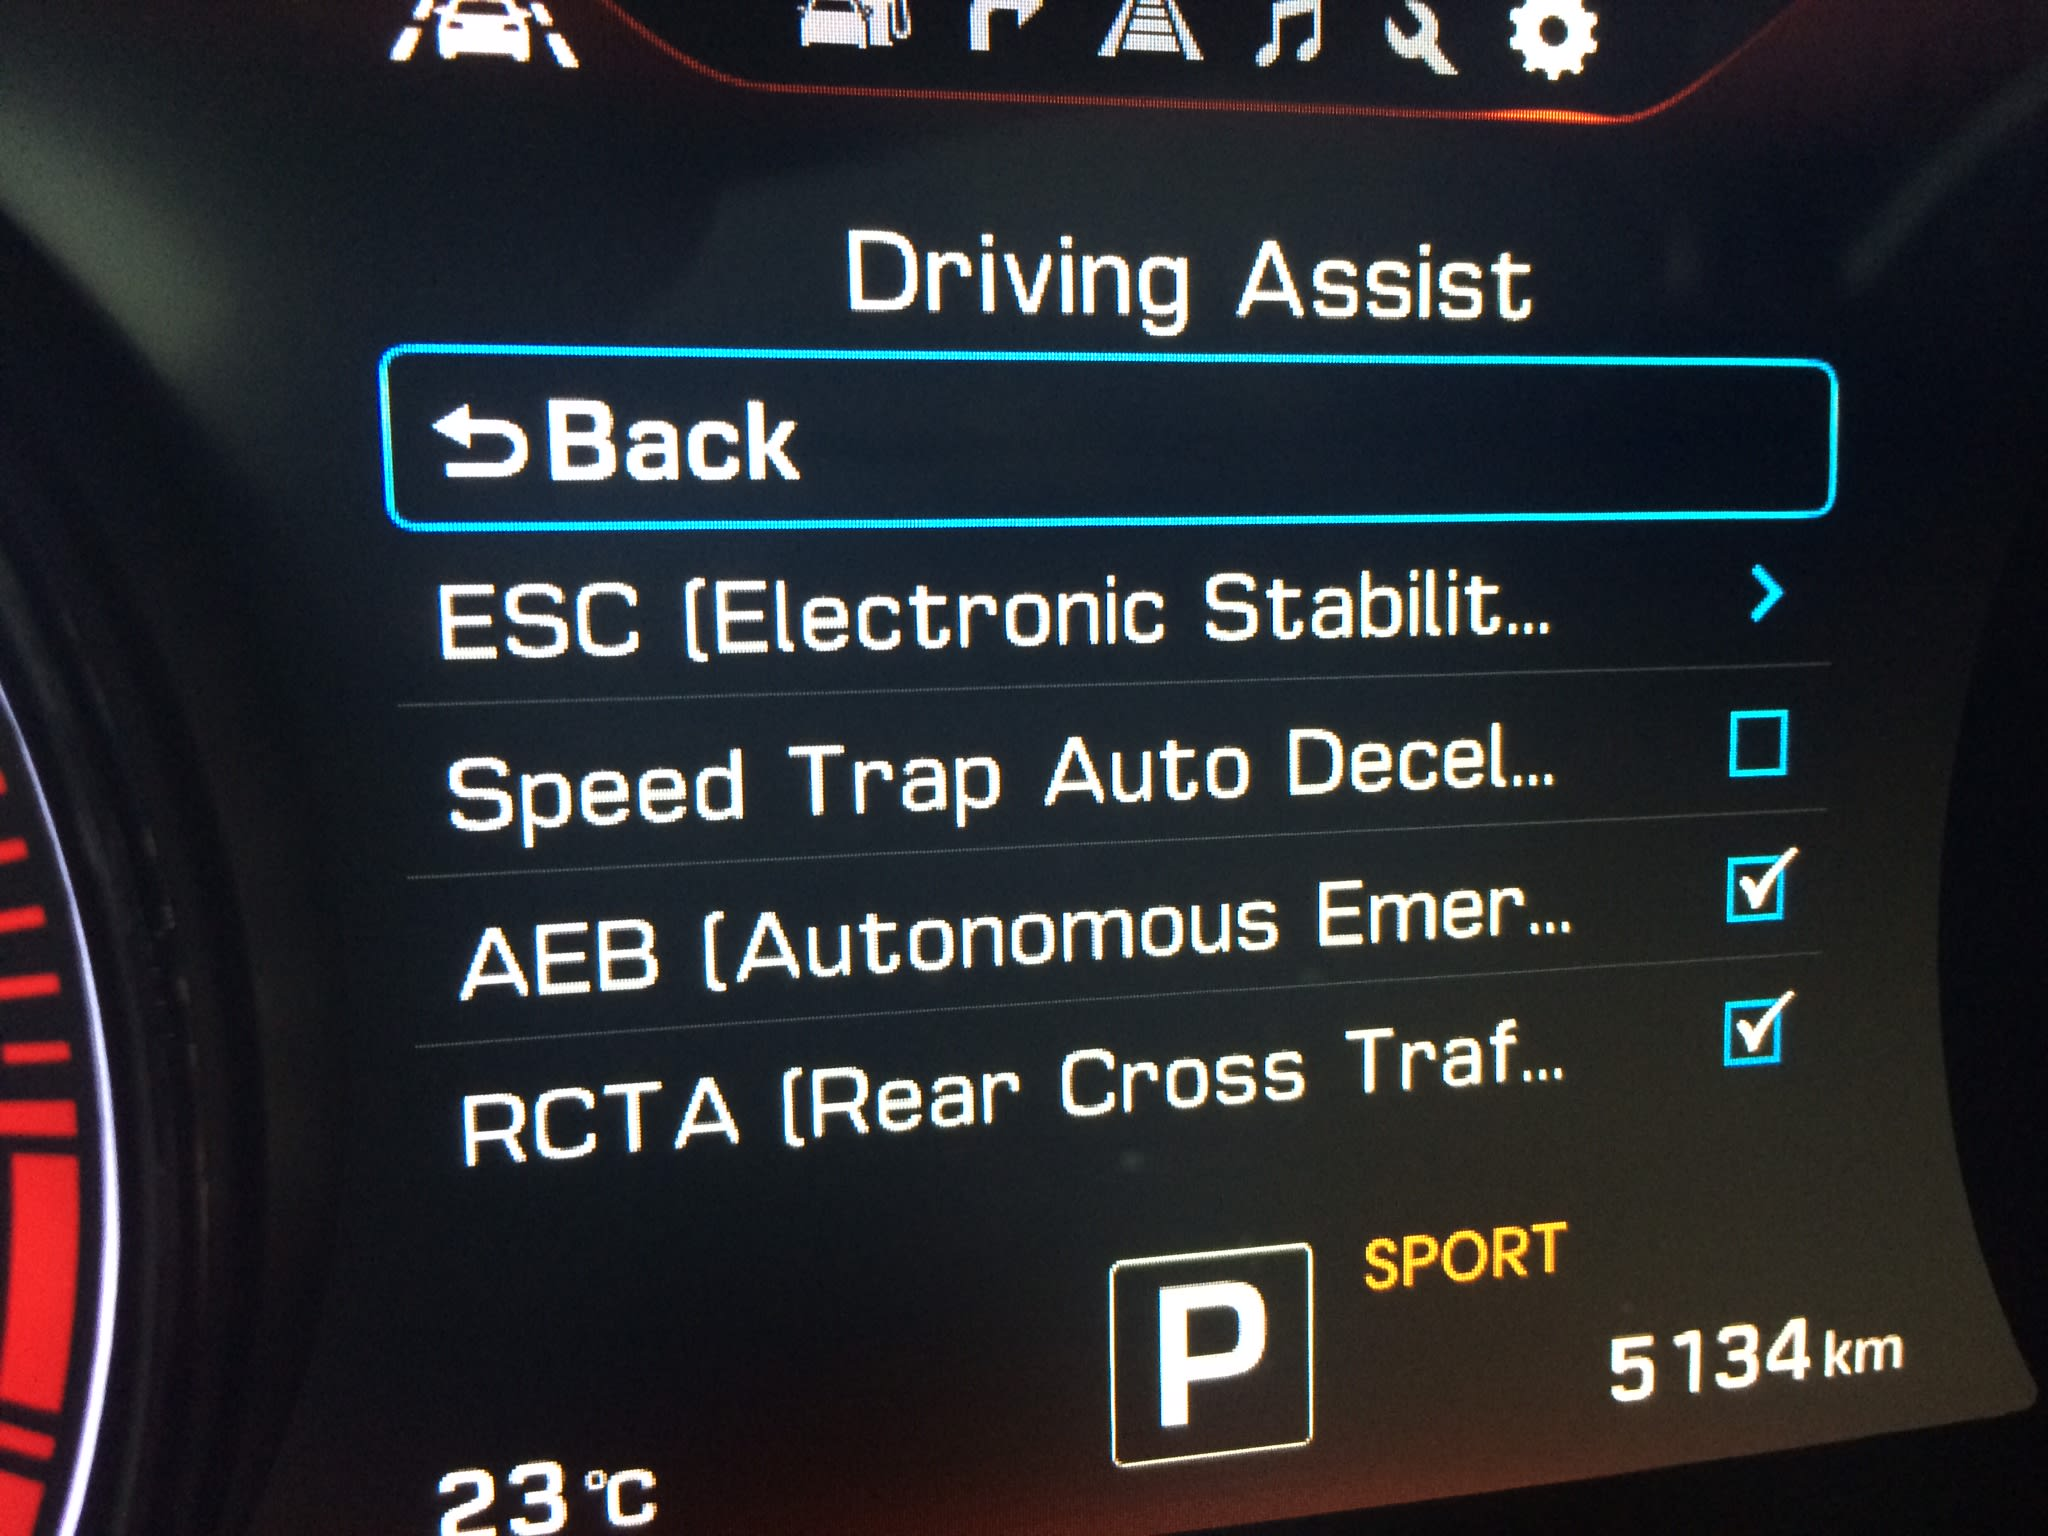 Speed Trap Auto Deceleration